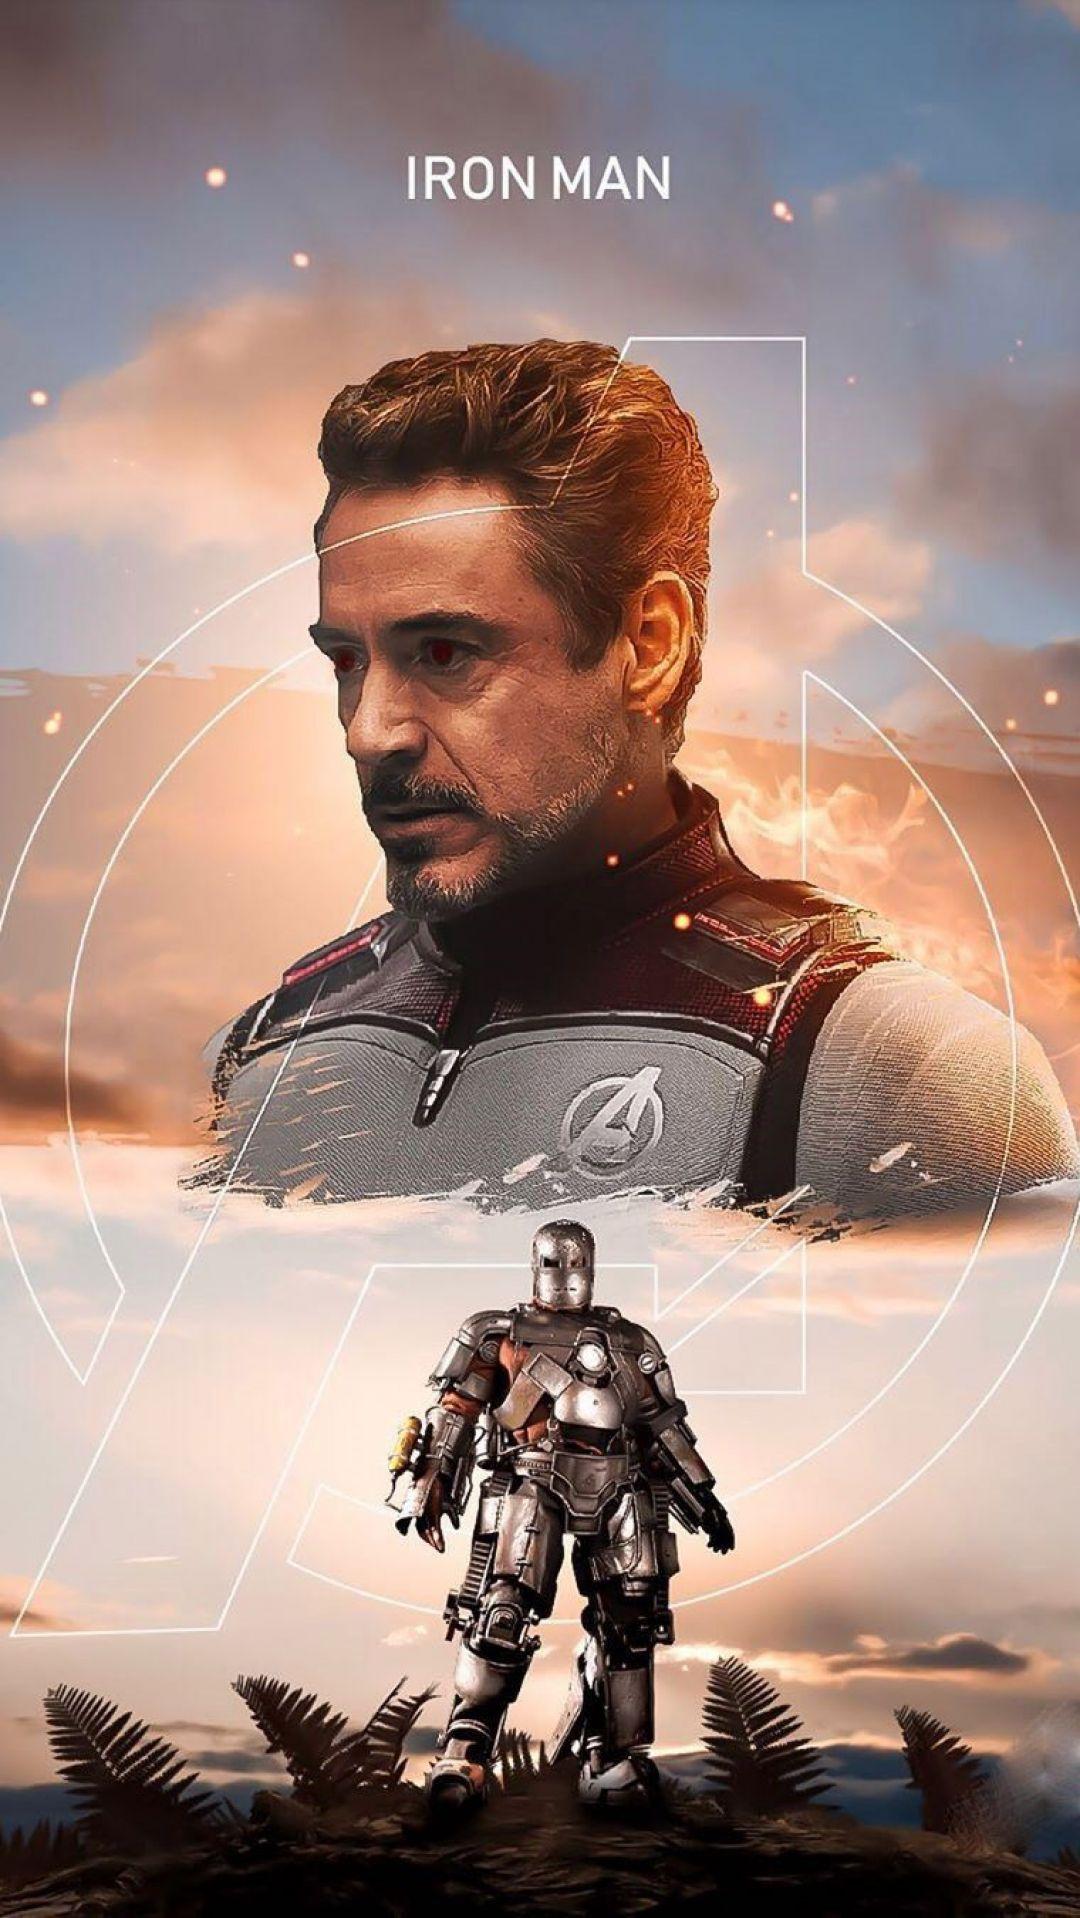 Iron Man Android Iphone Desktop Hd Backgrounds Wallpapers 1080p 4k 118671 Hdwallpapers Iron Man Tony Stark Tony Stark Wallpaper Iron Man Avengers